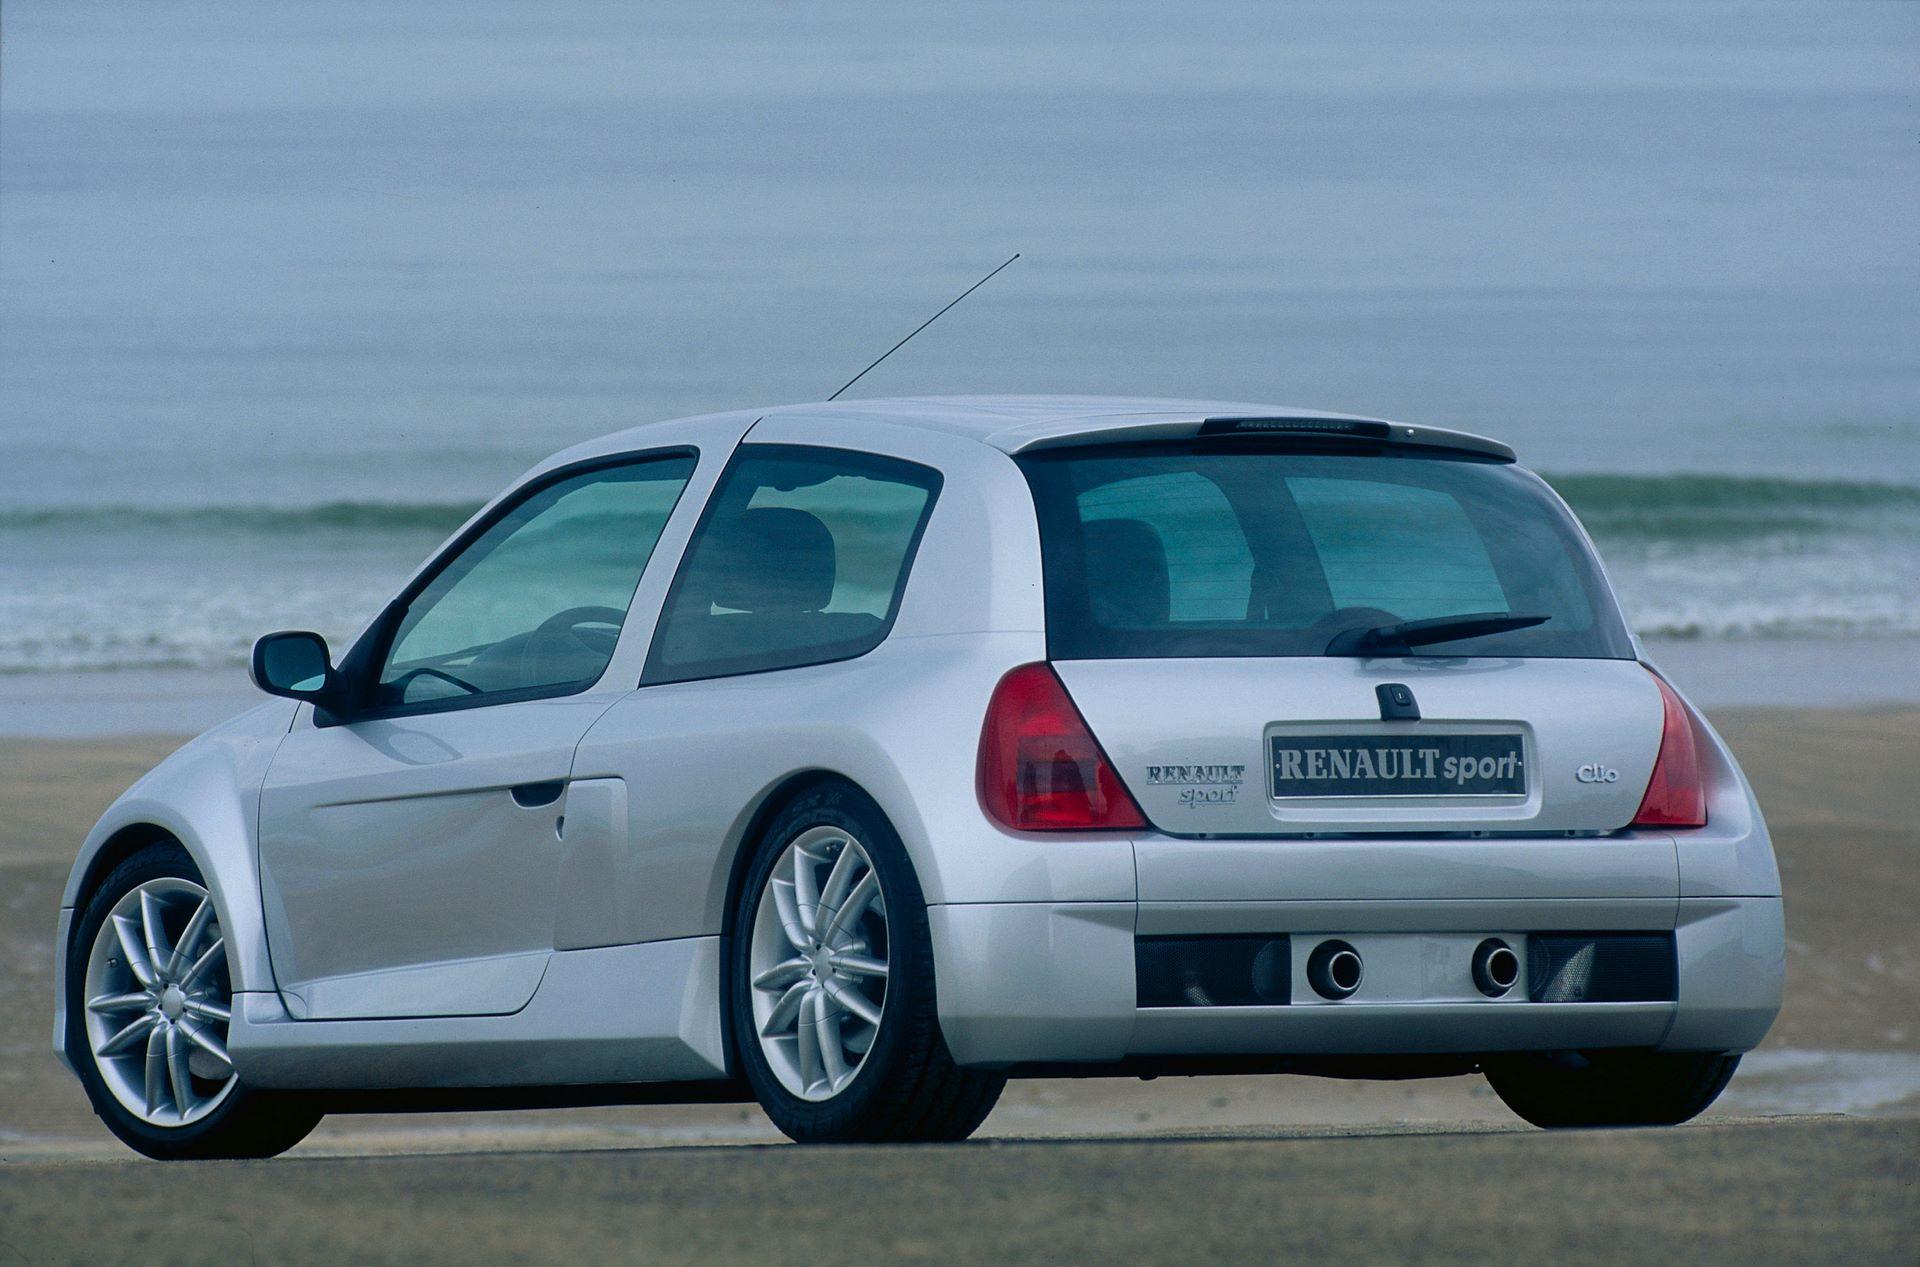 RENAULT CLIO RENAULT SPORT V6 24V